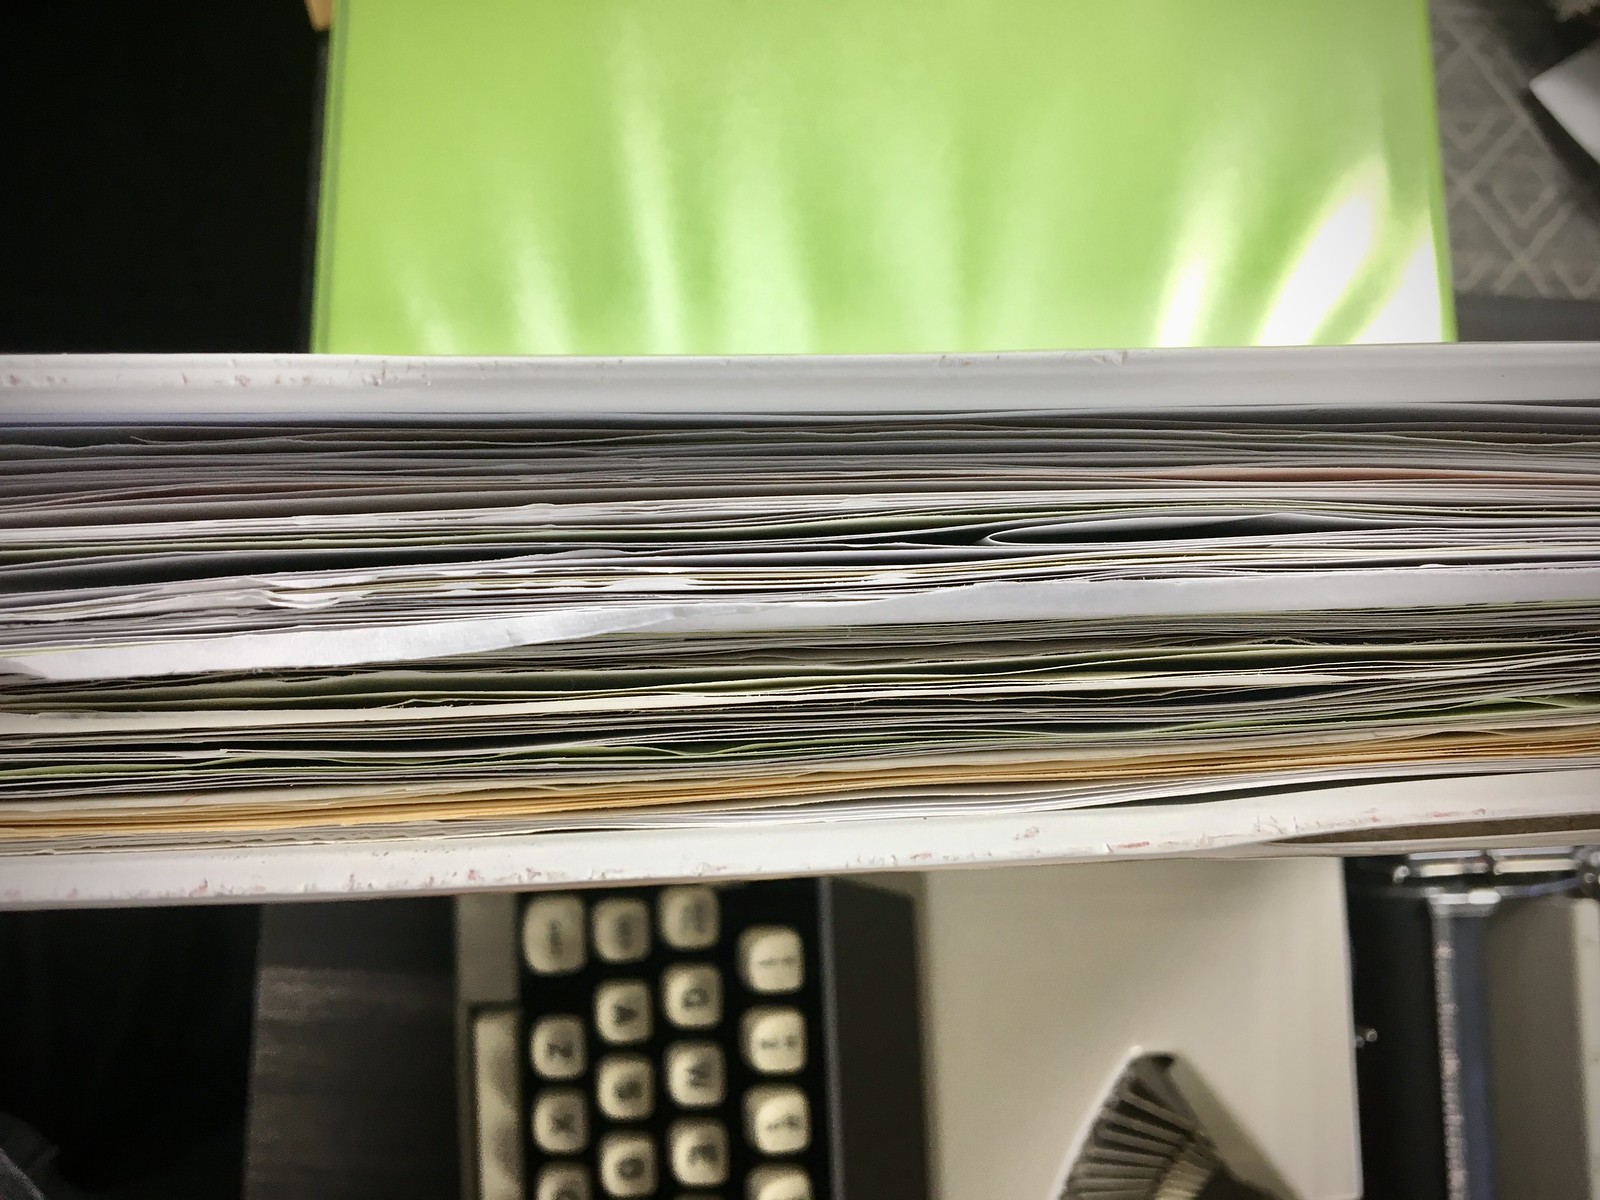 Typewritten Journal Binder, June 2020 to February 2021